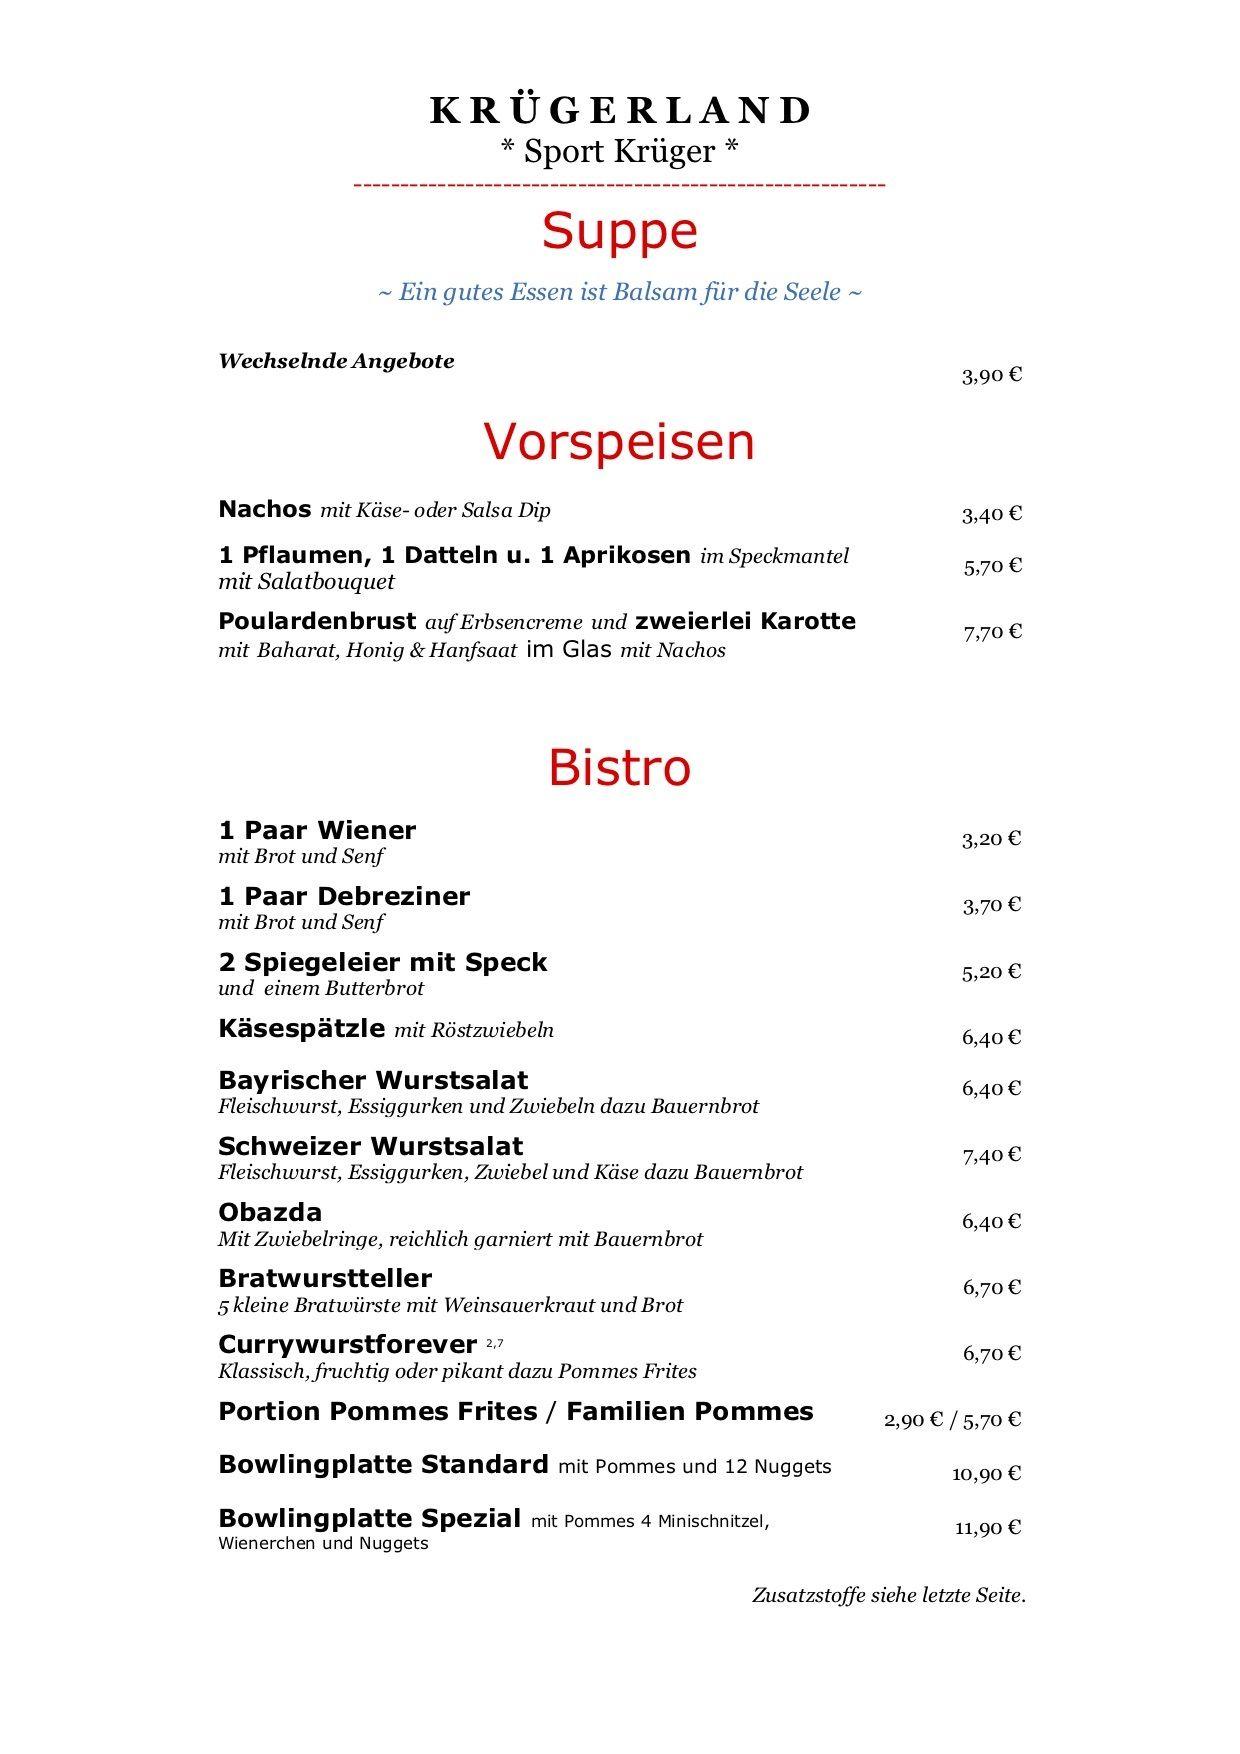 Speisekarte Sport Krüger | Krügerland